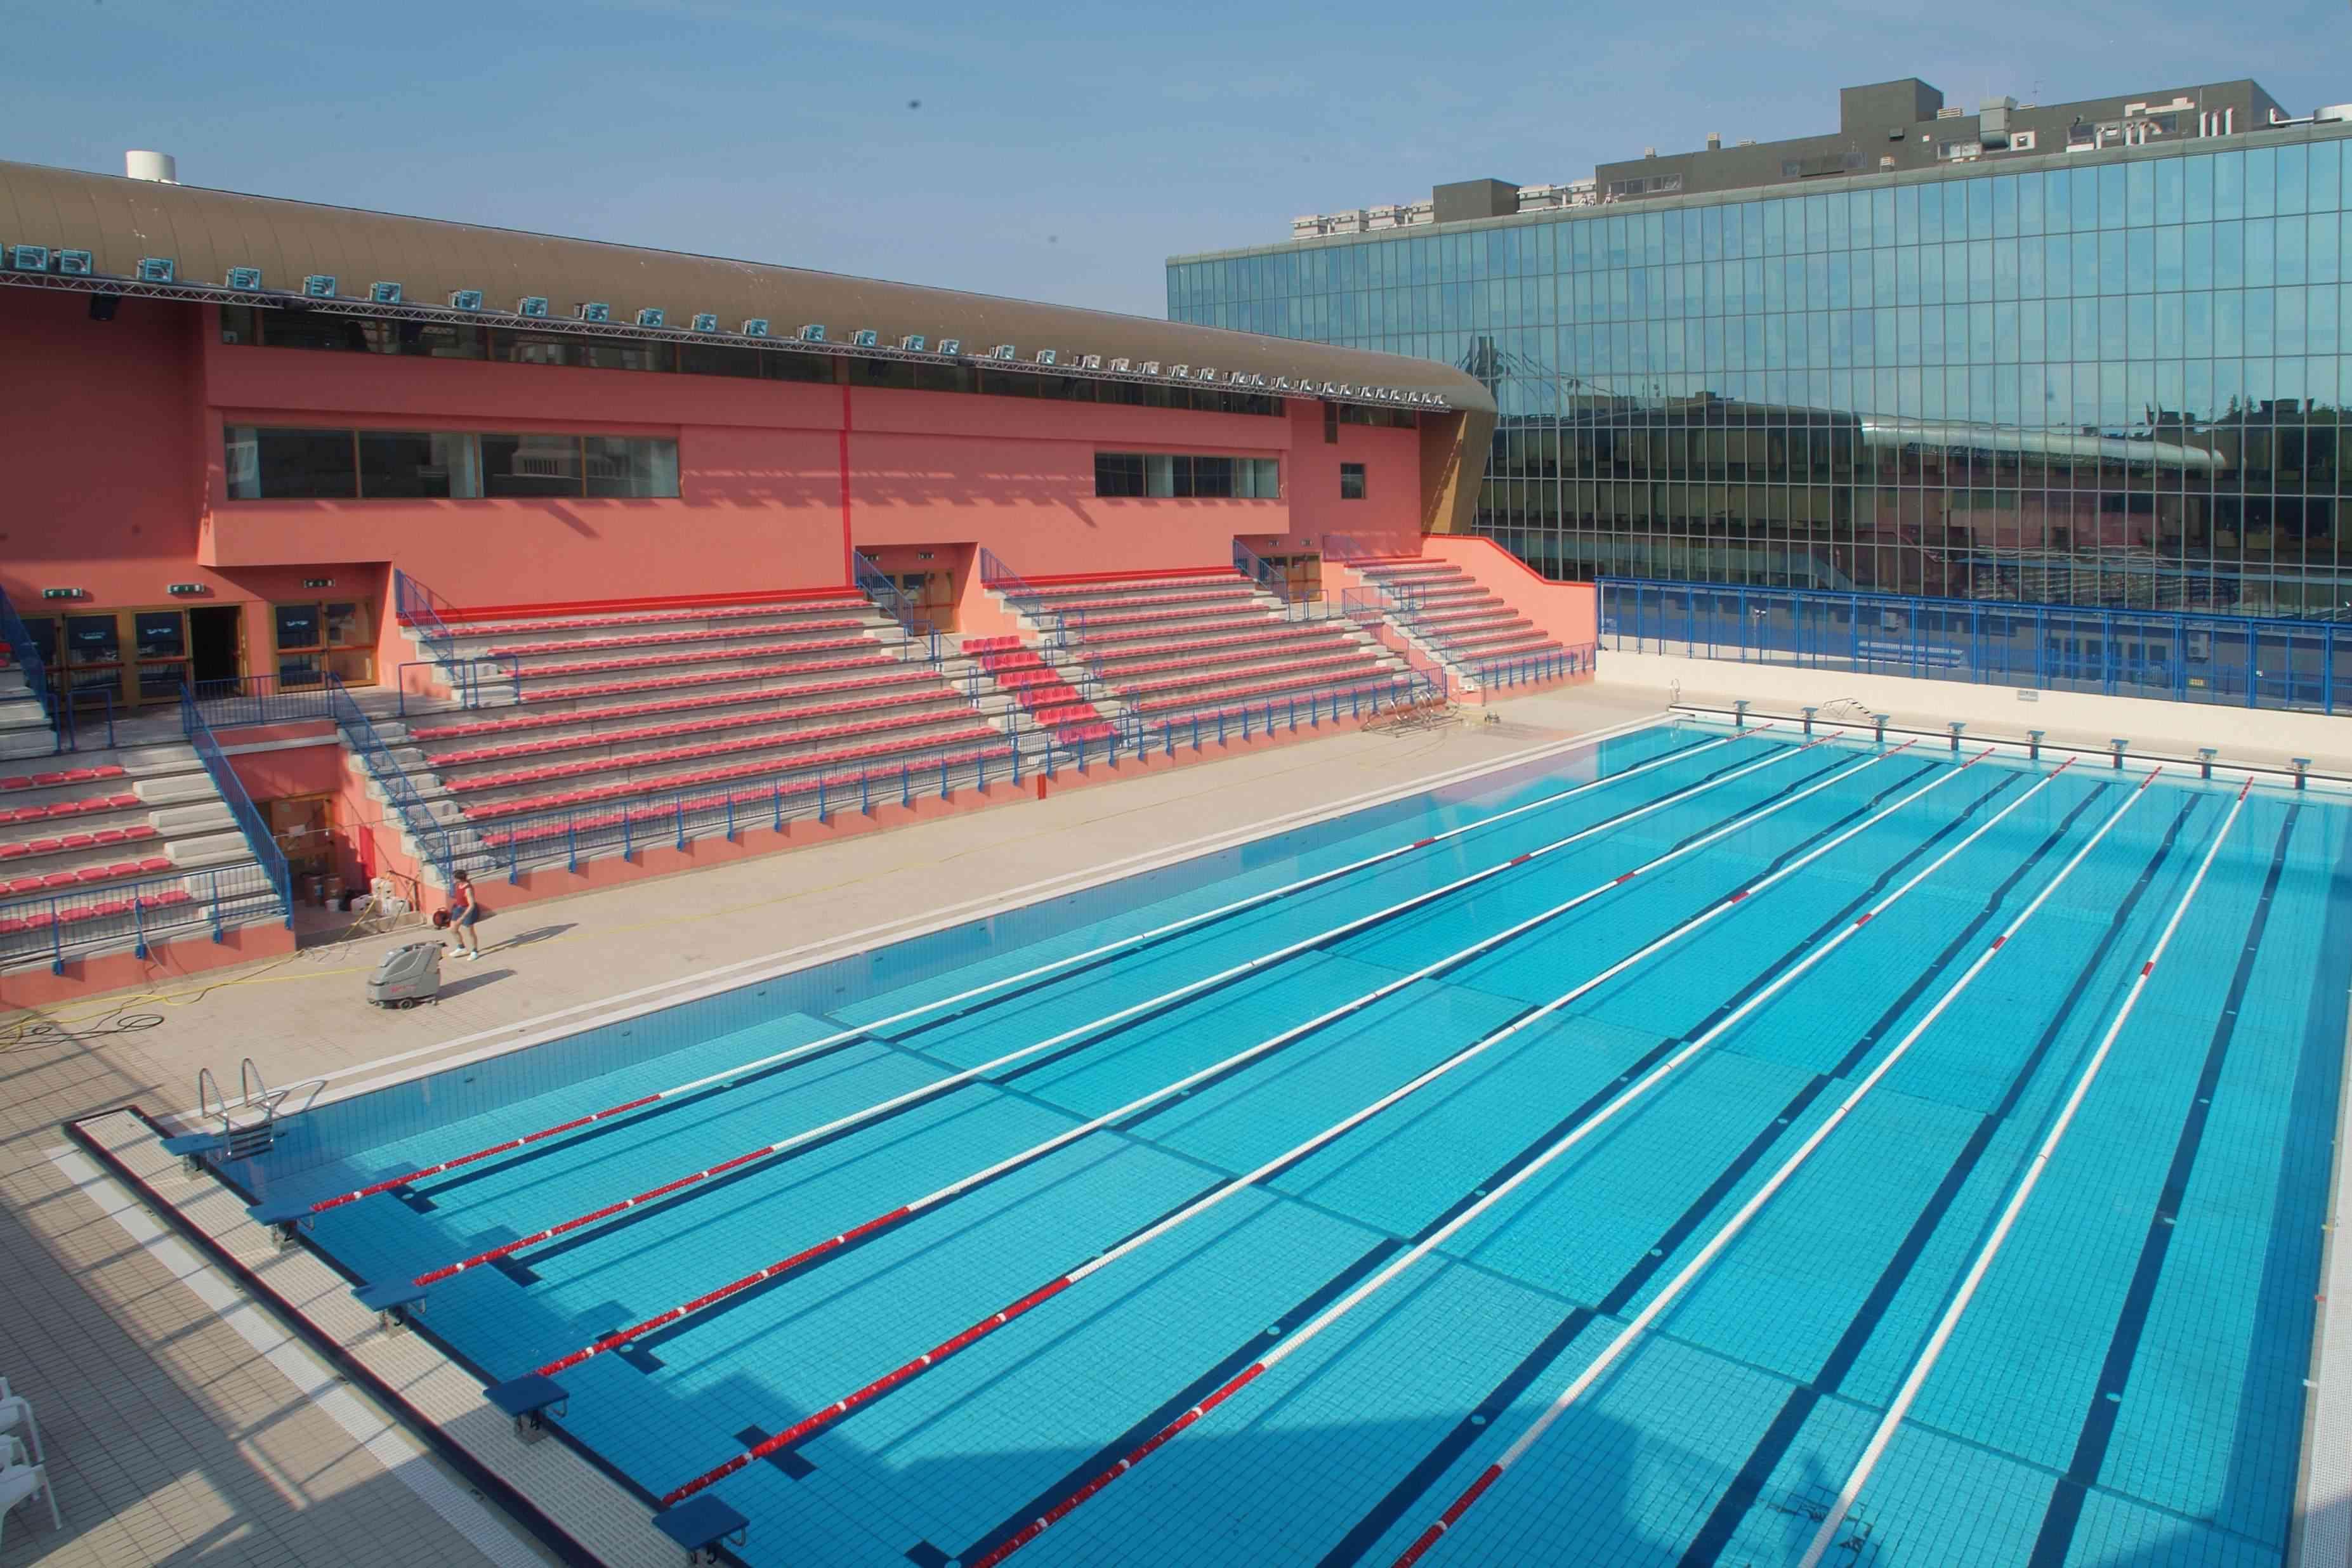 Prezzi e orari piscina scoperta piscina bianchi trieste - Piscina limbiate prezzi 2017 ...